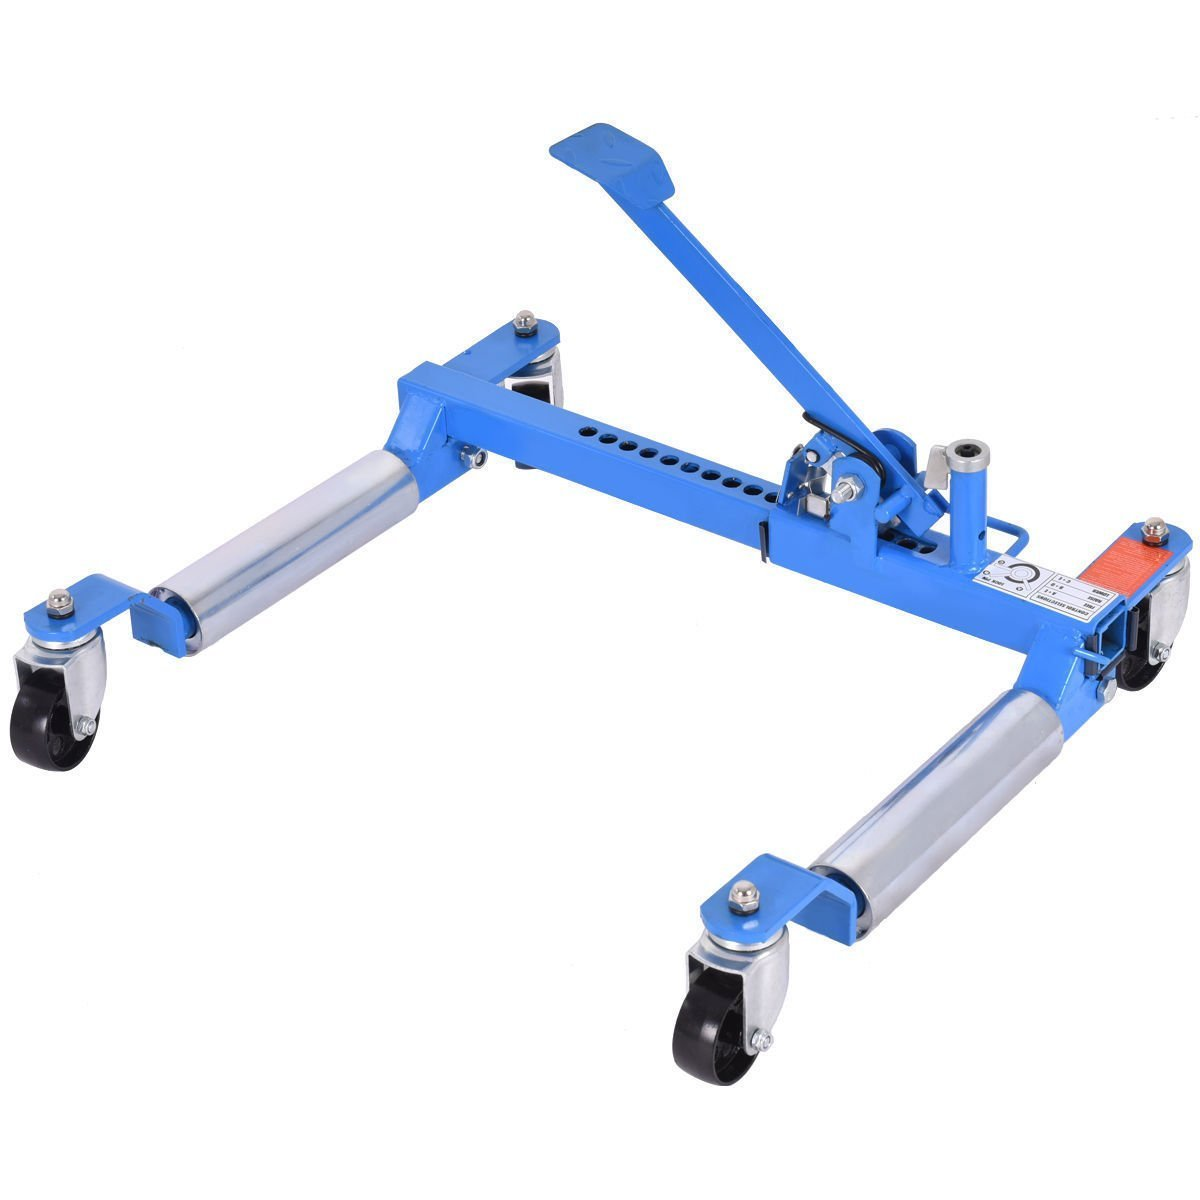 Goplus Wheel Dolly Car Skates Vehicle Positioning Hydraulic Tire Jack, 1250 lb (Blue) by Goplus (Image #1)